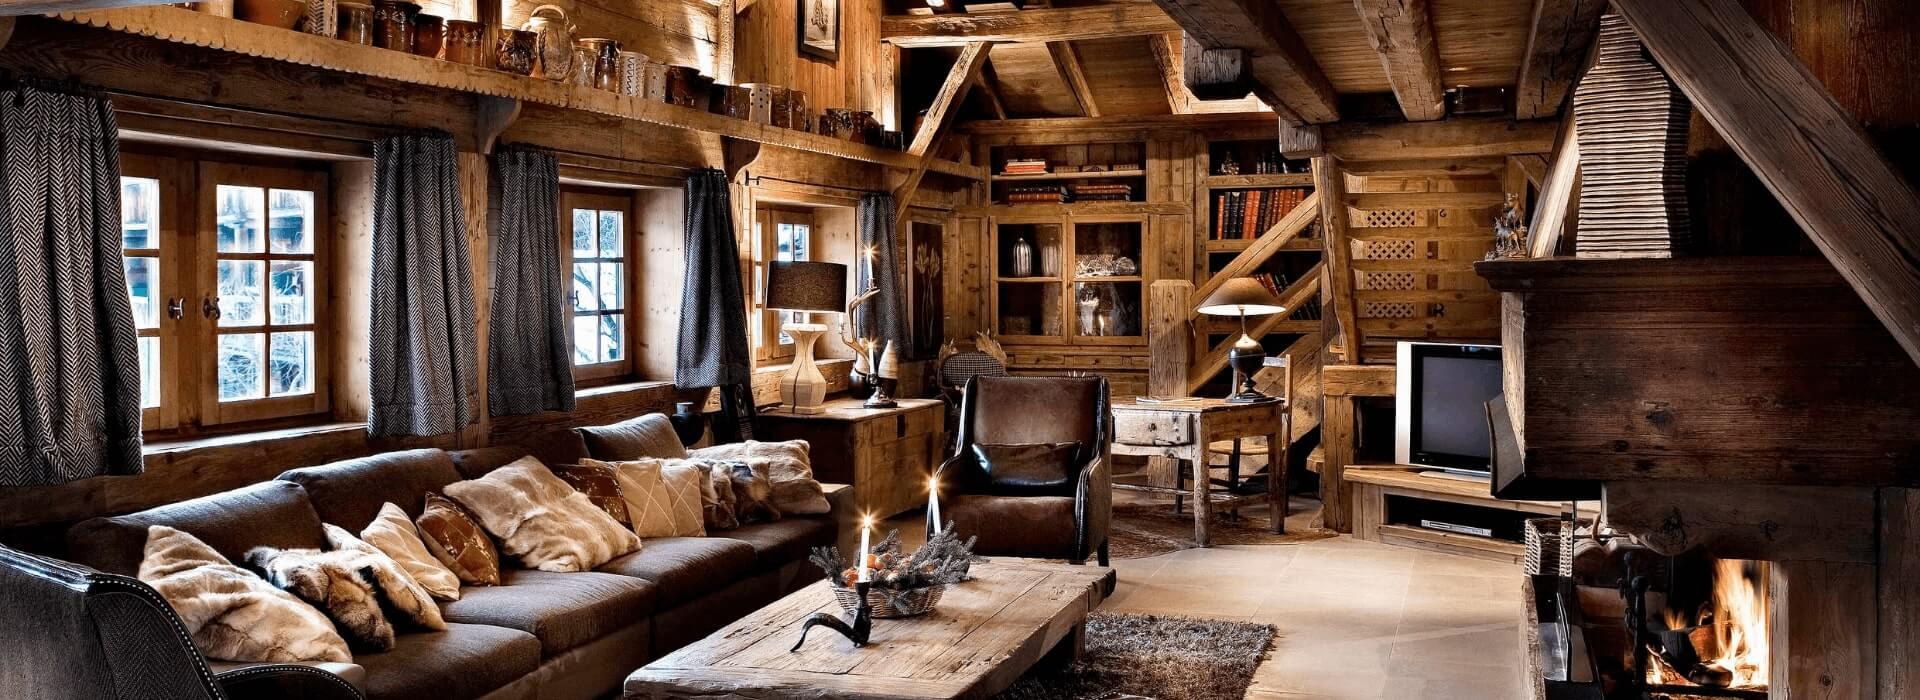 Luxury chalets for rent Haute Savoie